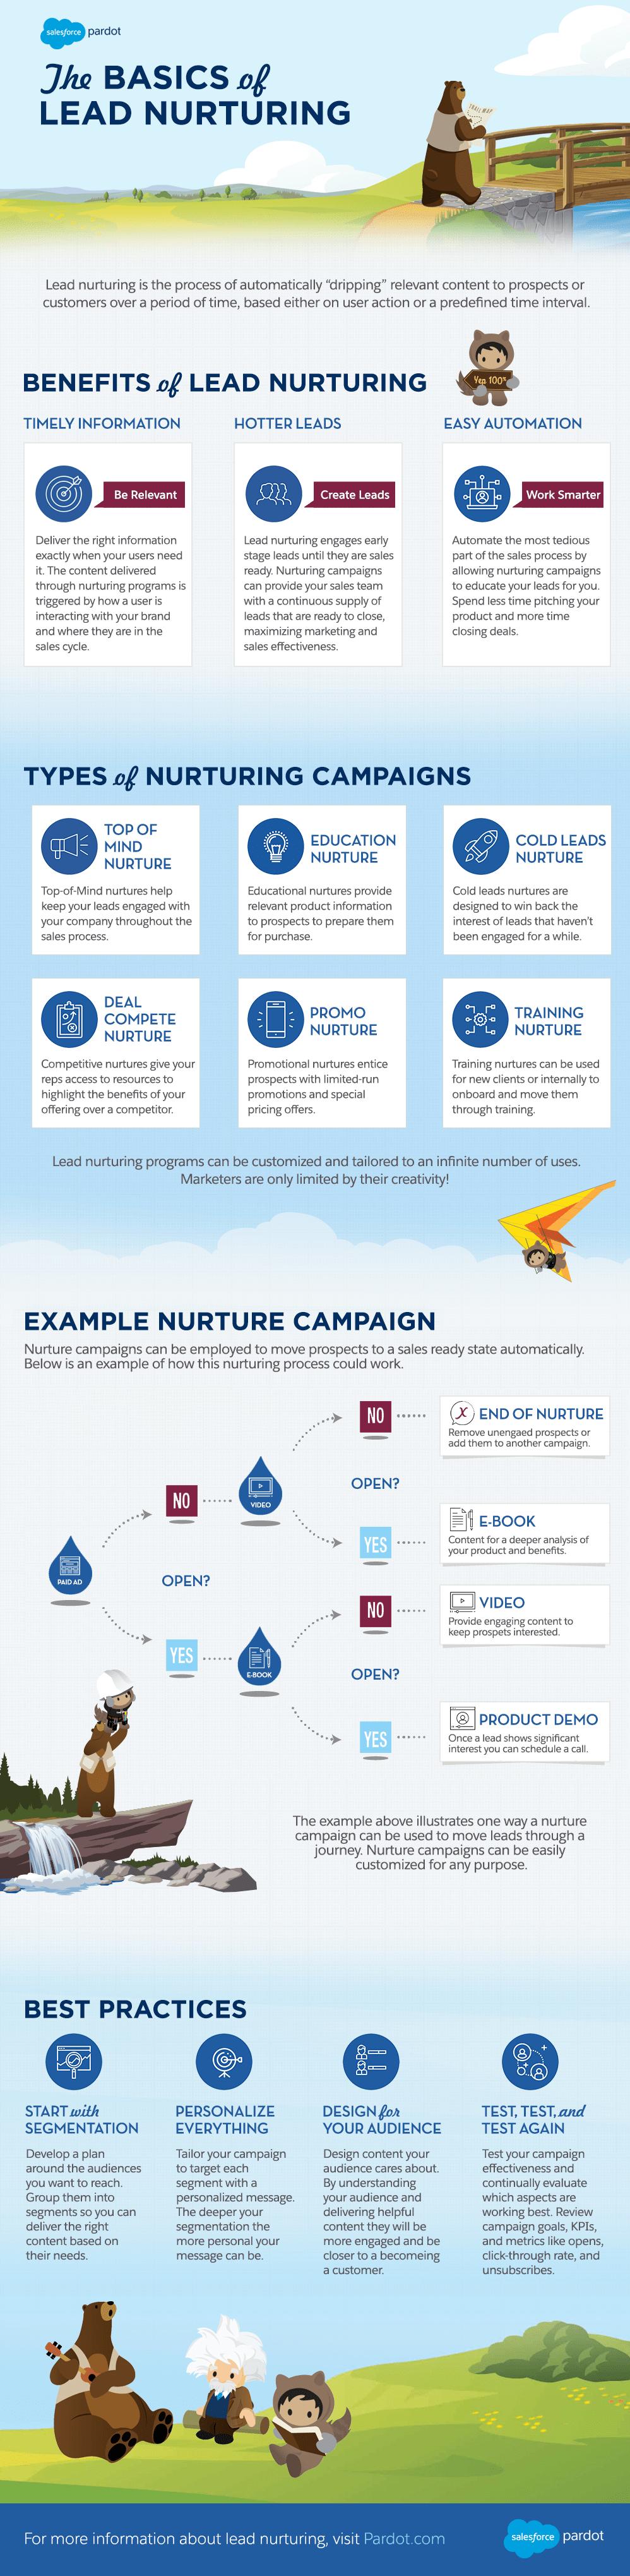 Infographic: Lead Nurturing Basics